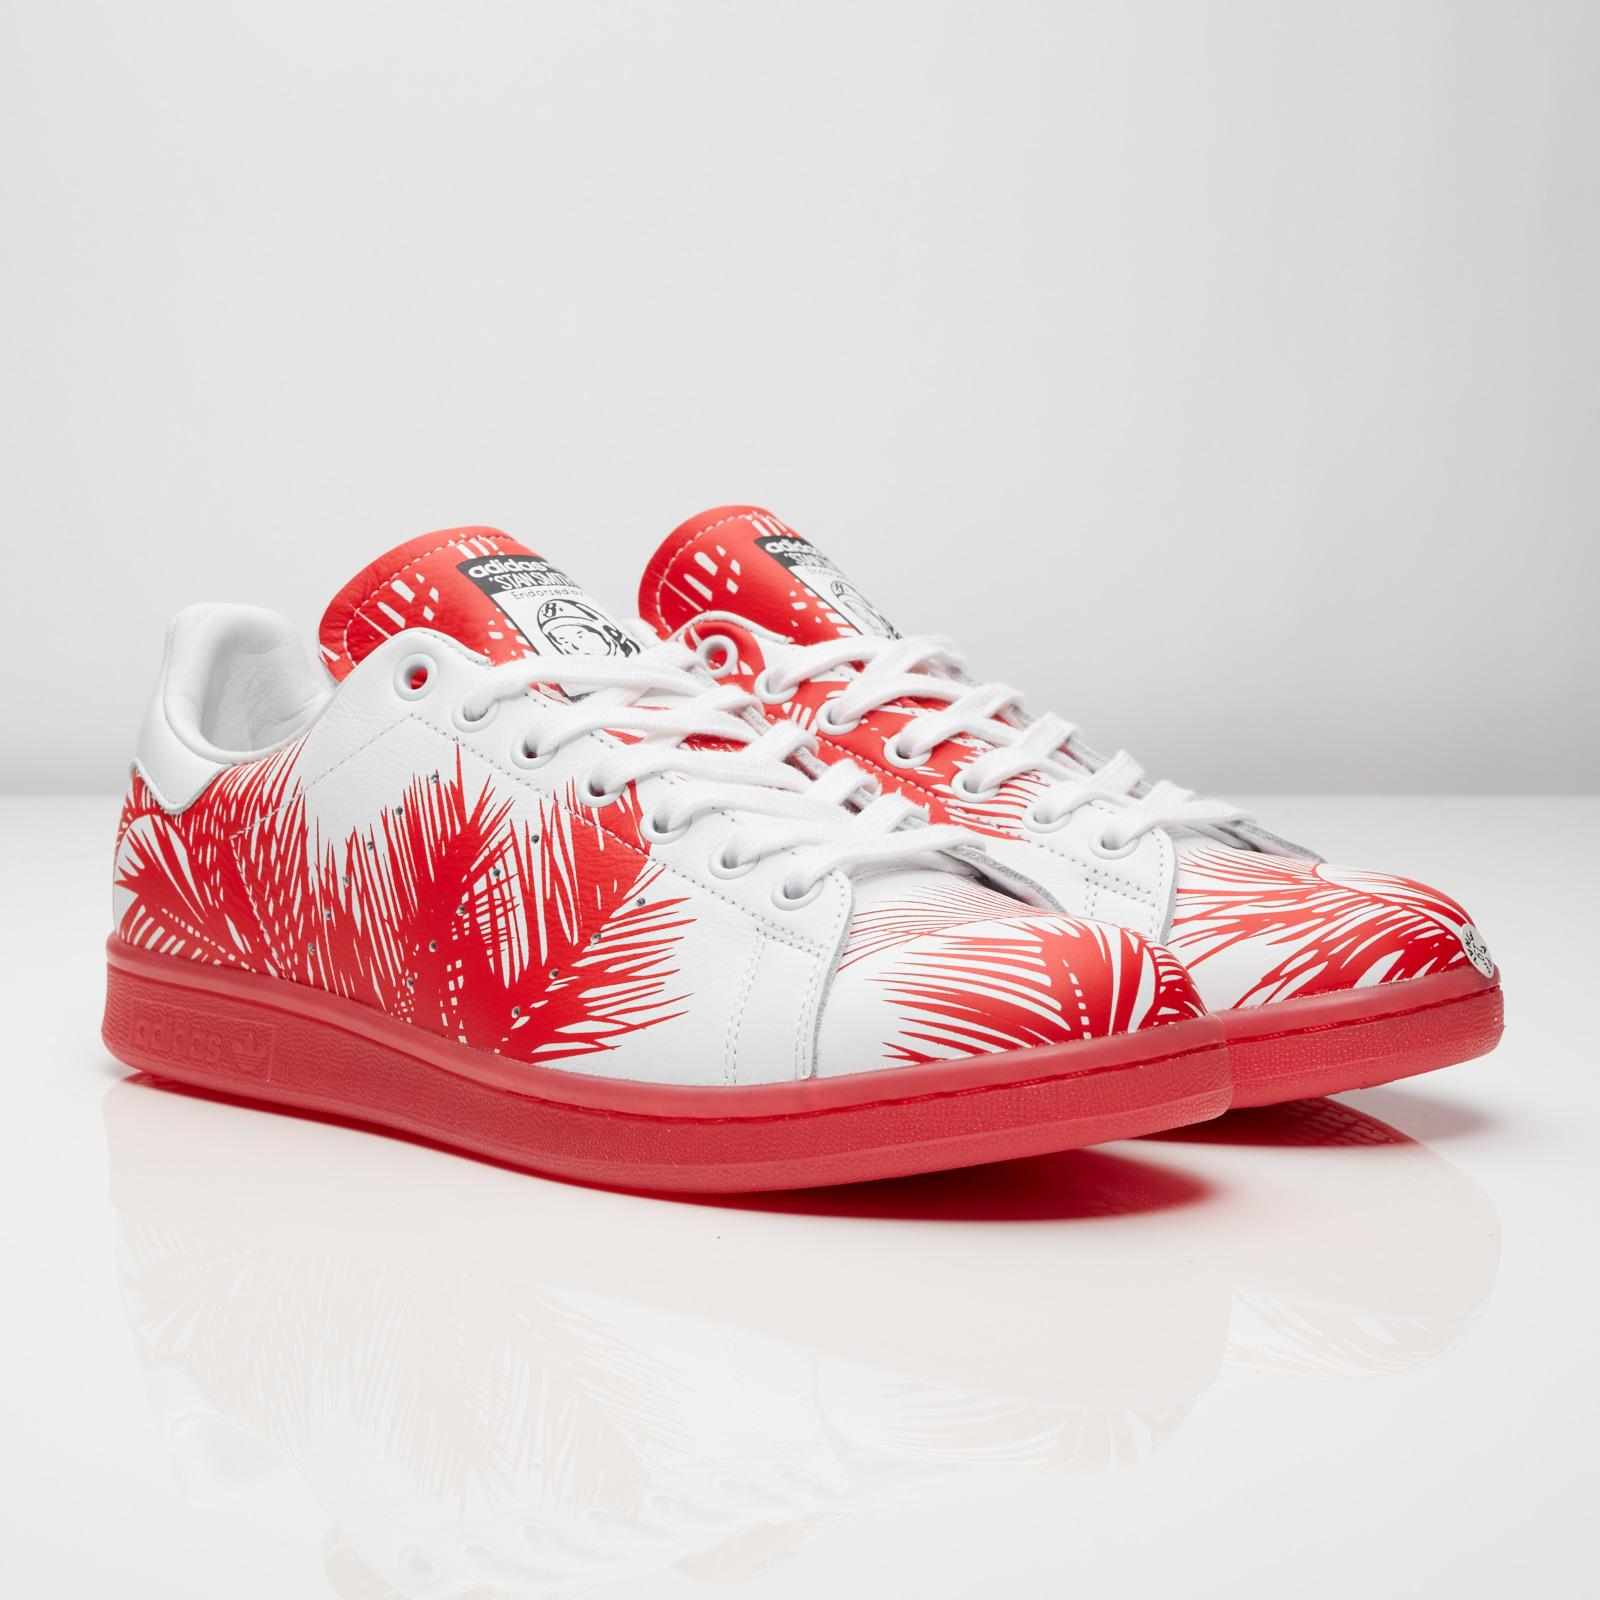 a567d889aef63 adidas PW Stan Smith BBC Palm Tree - S82072 - Sneakersnstuff ...